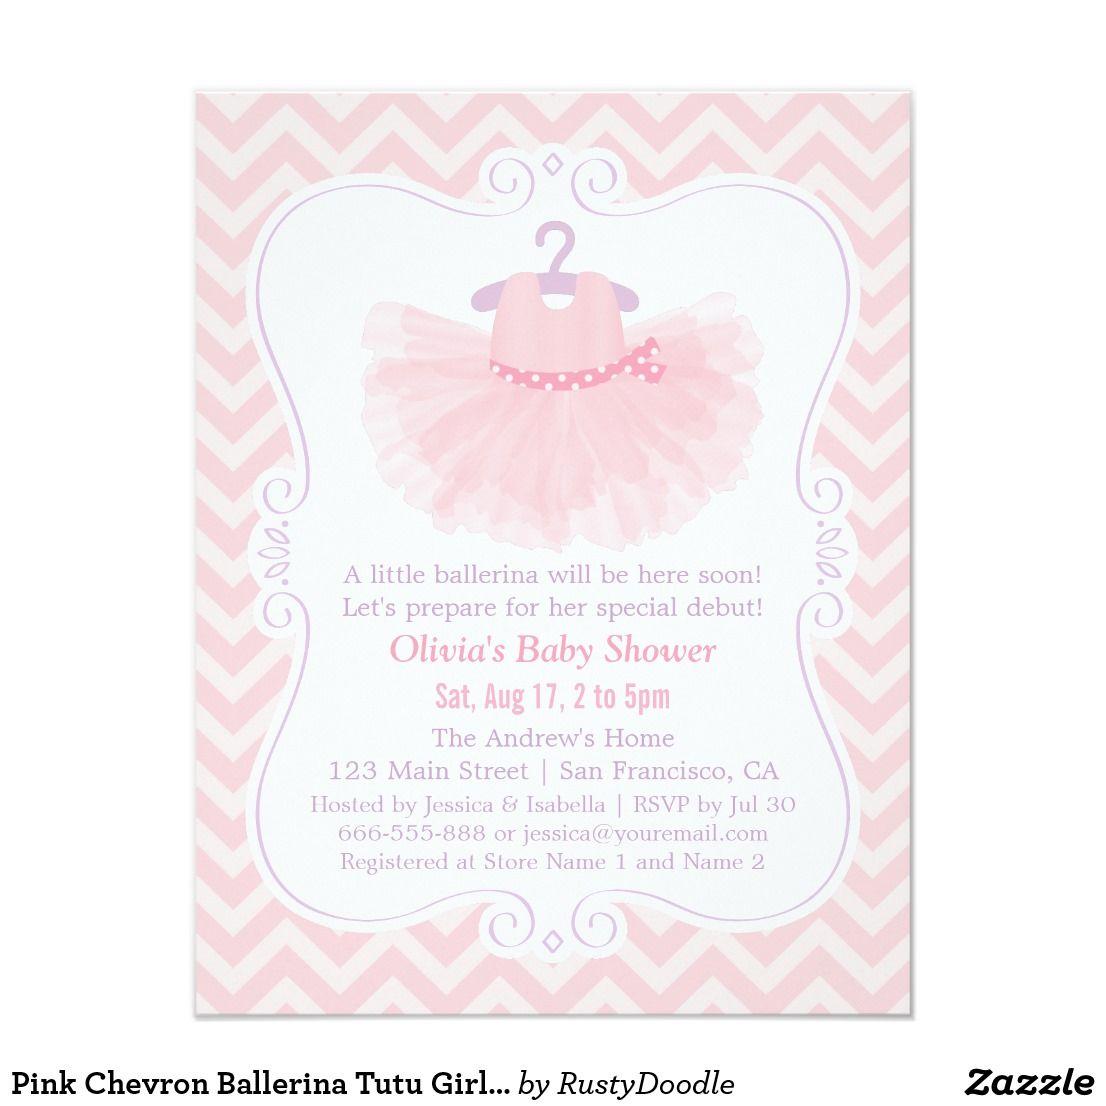 pink chevron ballerina tutu girl baby shower card